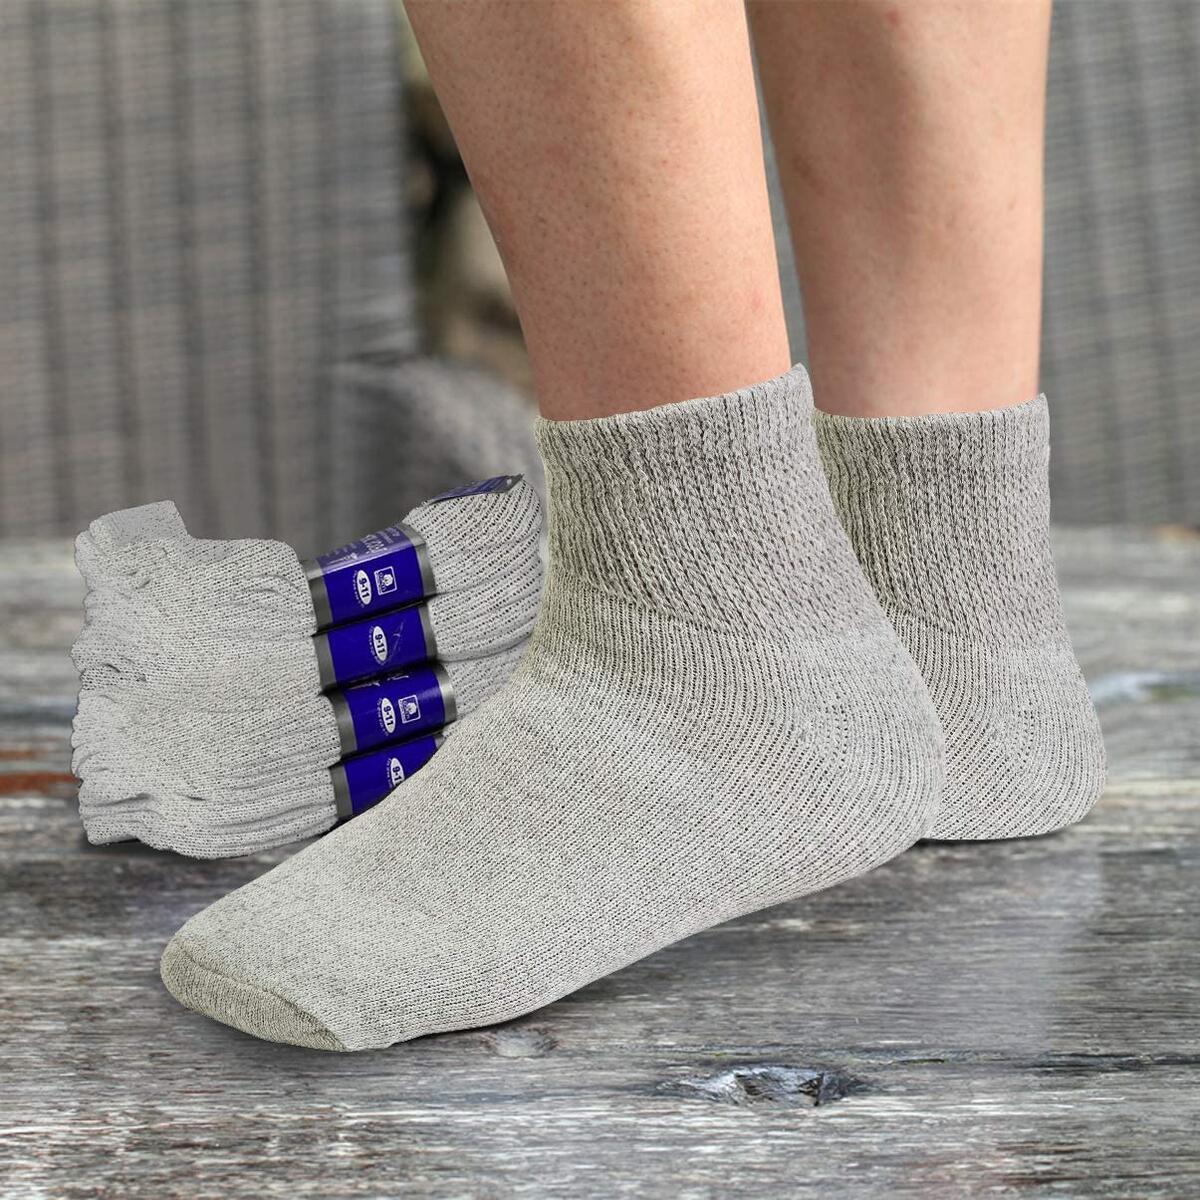 Diabetic Ankle Socks Mens Womens Non-binding Socks Loose Fit 6 Pairs REBATE APPLIES TO GREY